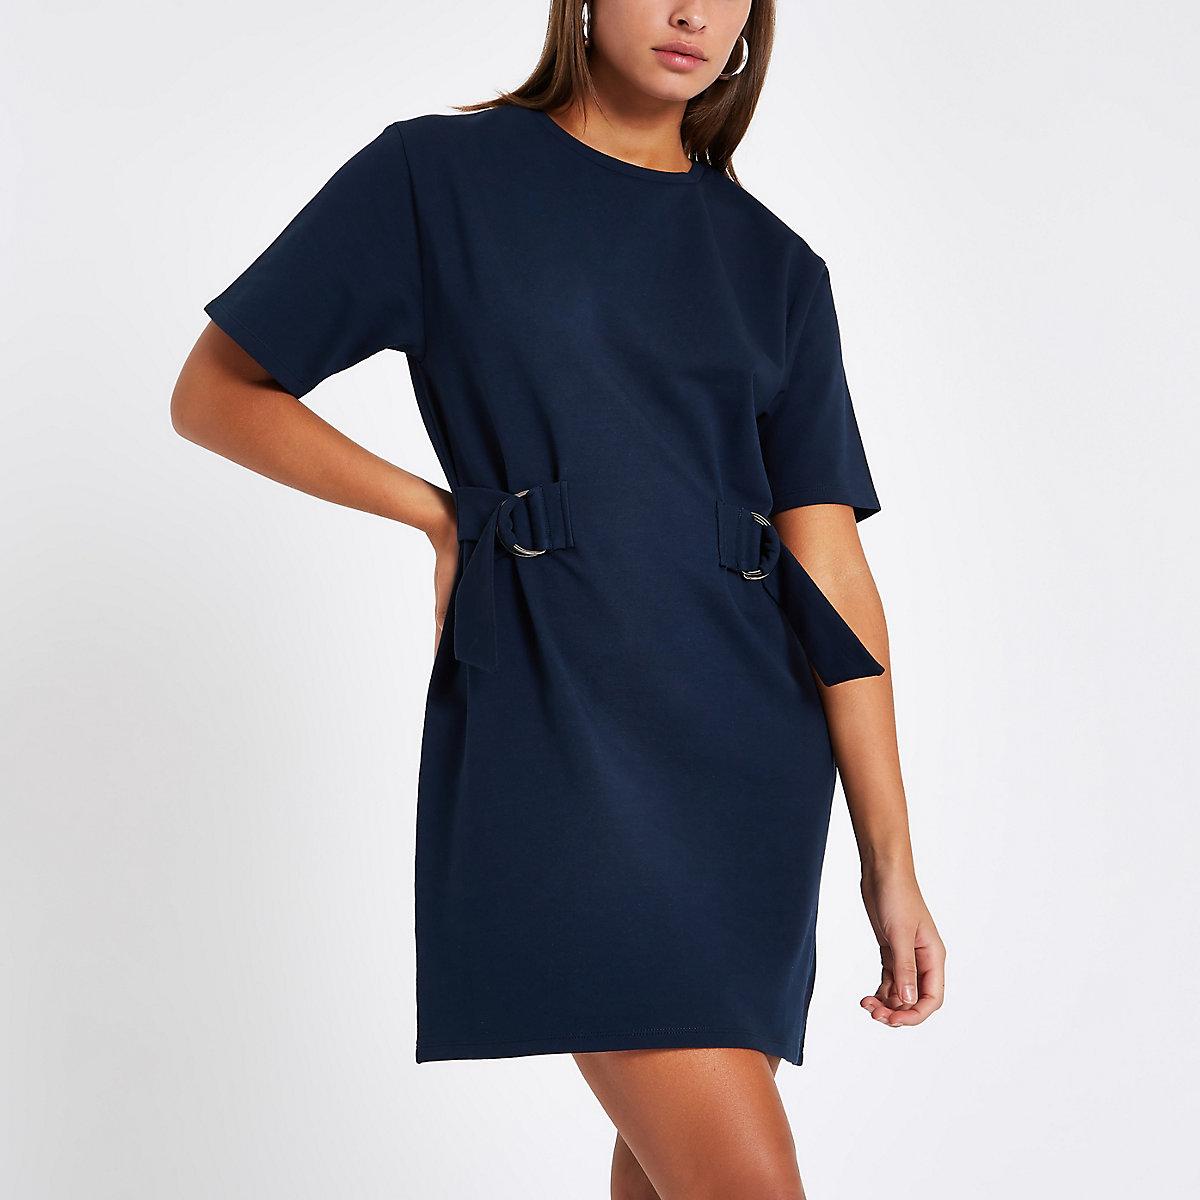 Navy drawstring waist mini dress